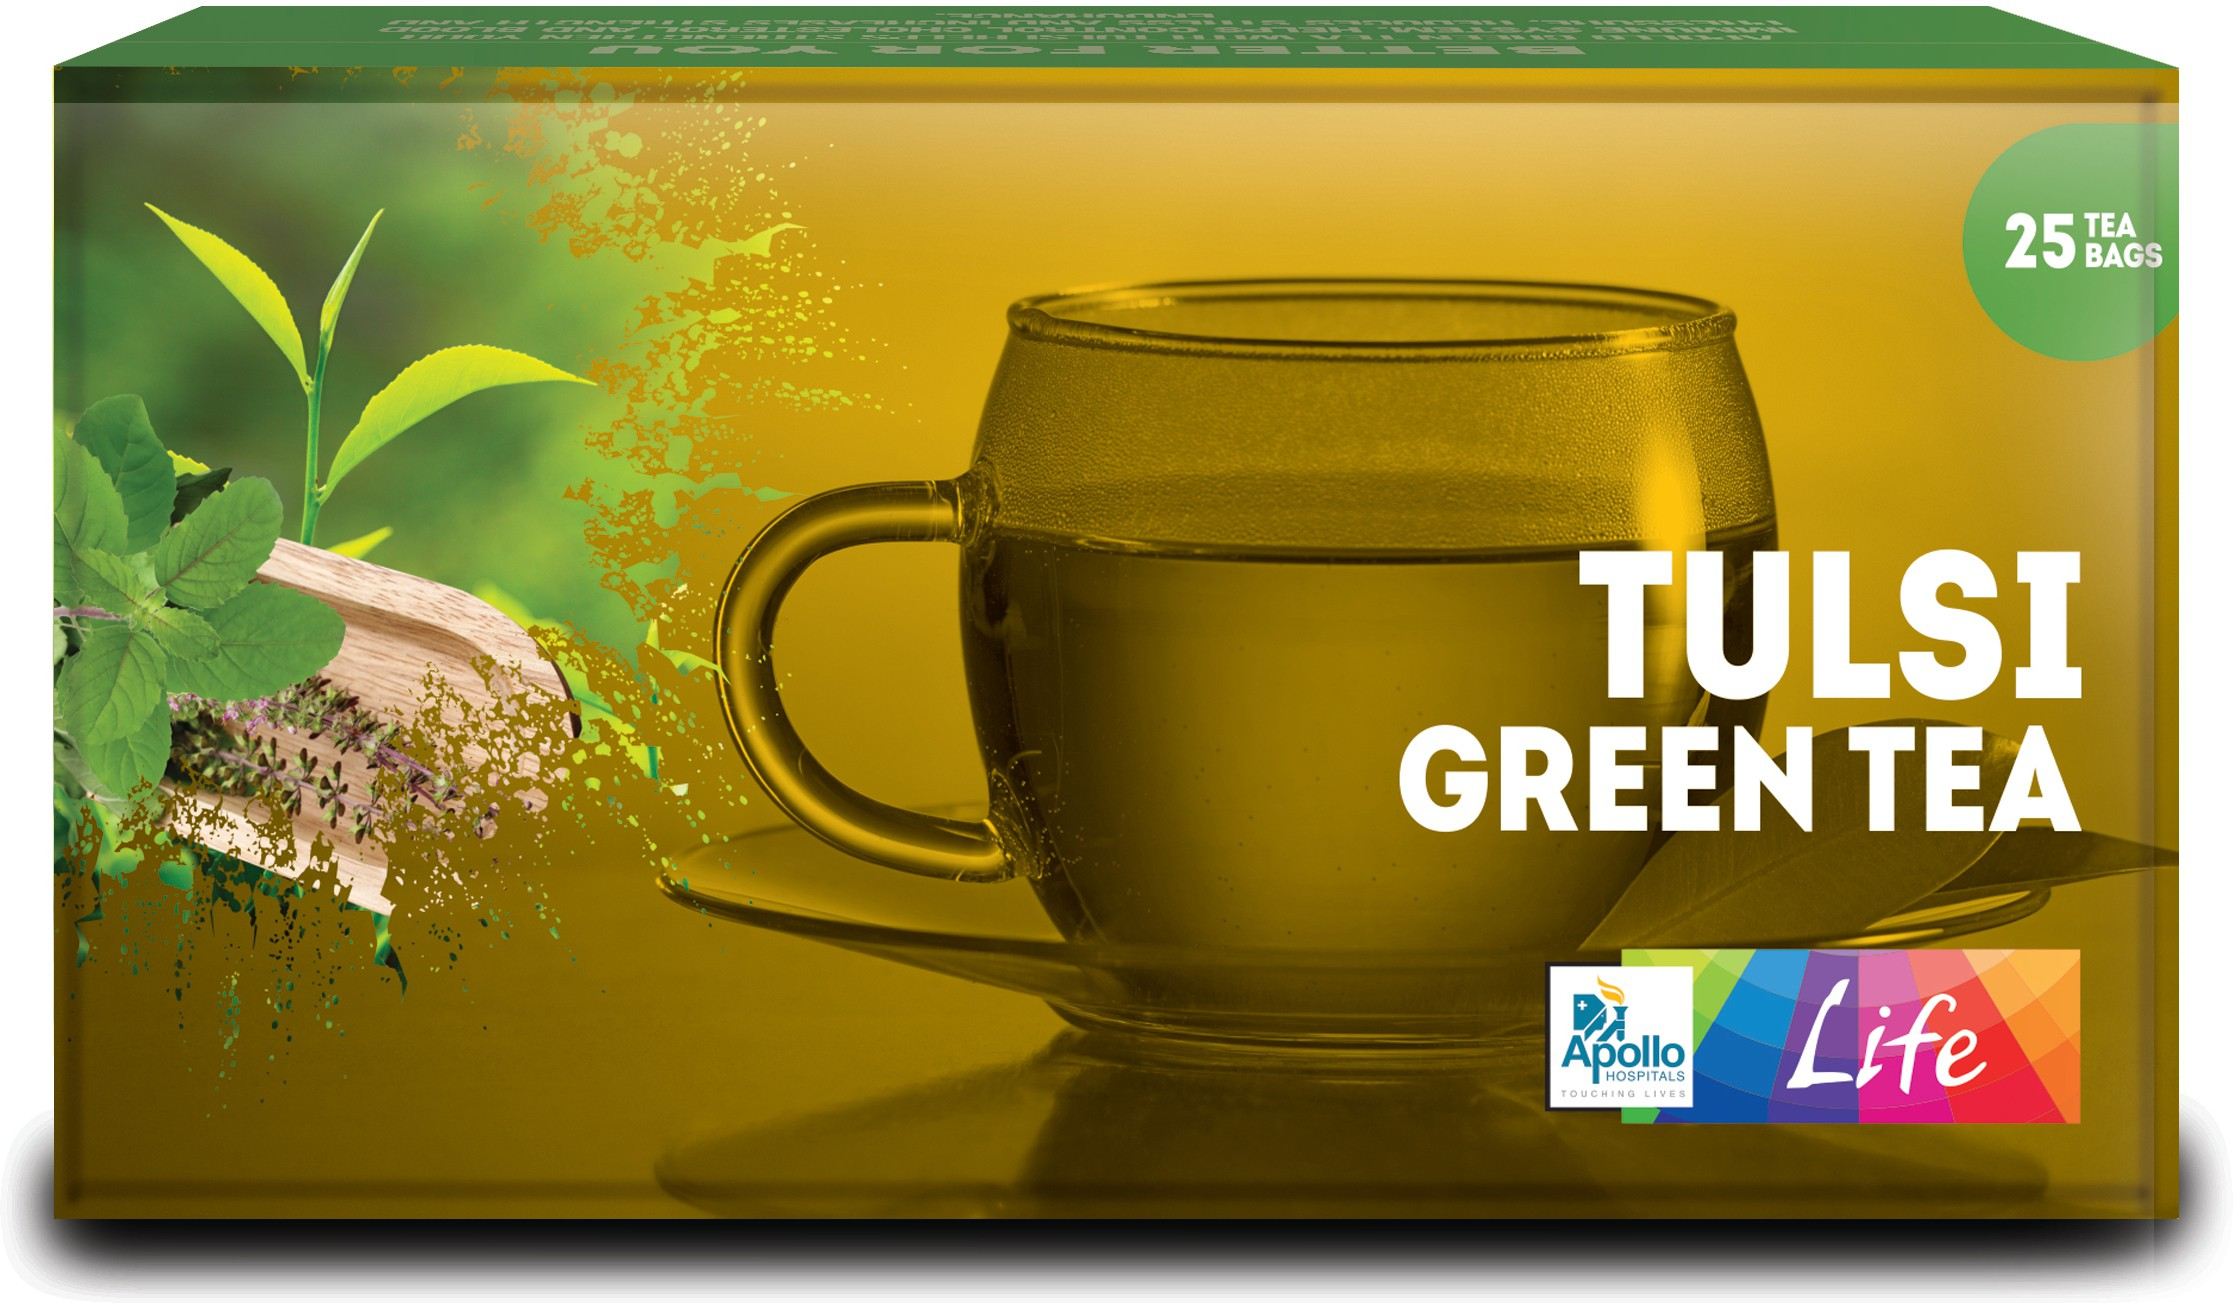 Apollo Pharmacy Tulsi Green Tea